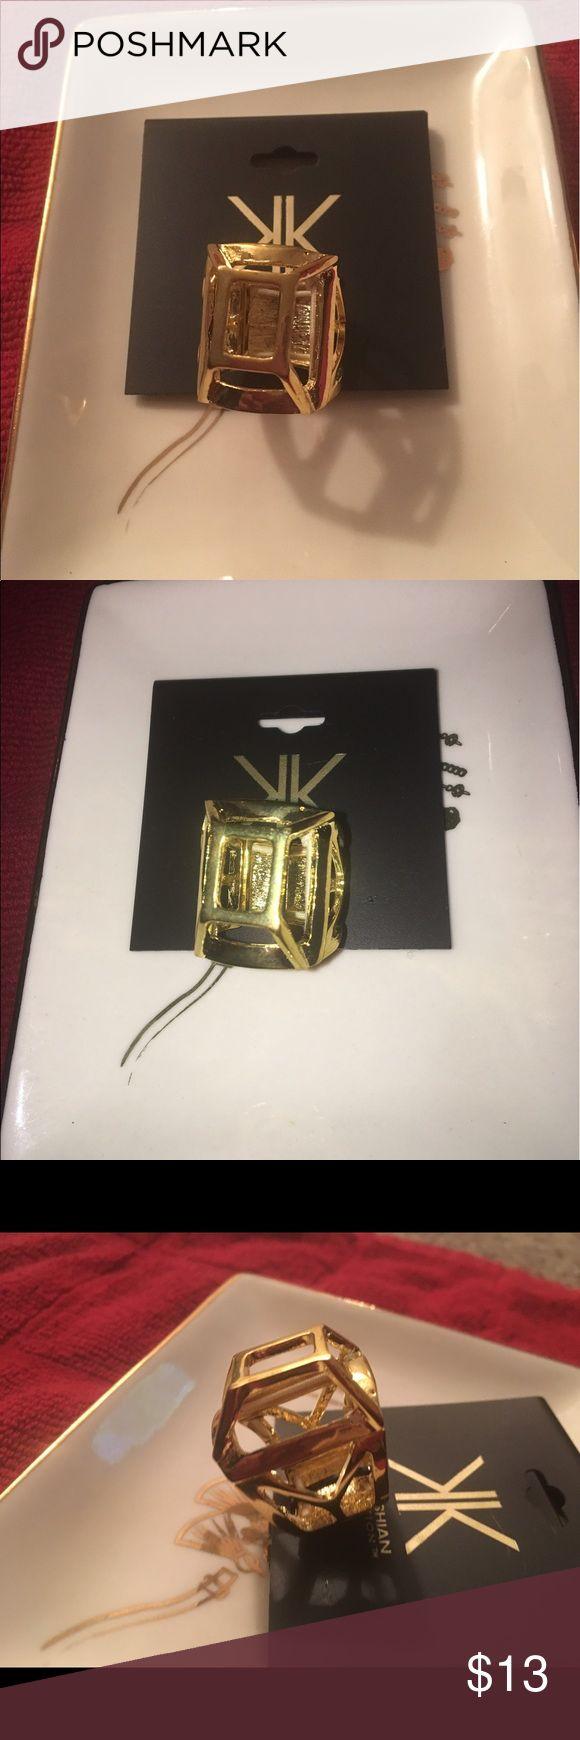 Kardashian Kollection Gold Stretch Ring Kardashian Kollection Ring  Gold  Adjustable size / Stretches  New never worn Kardashian Kollection Jewelry Rings